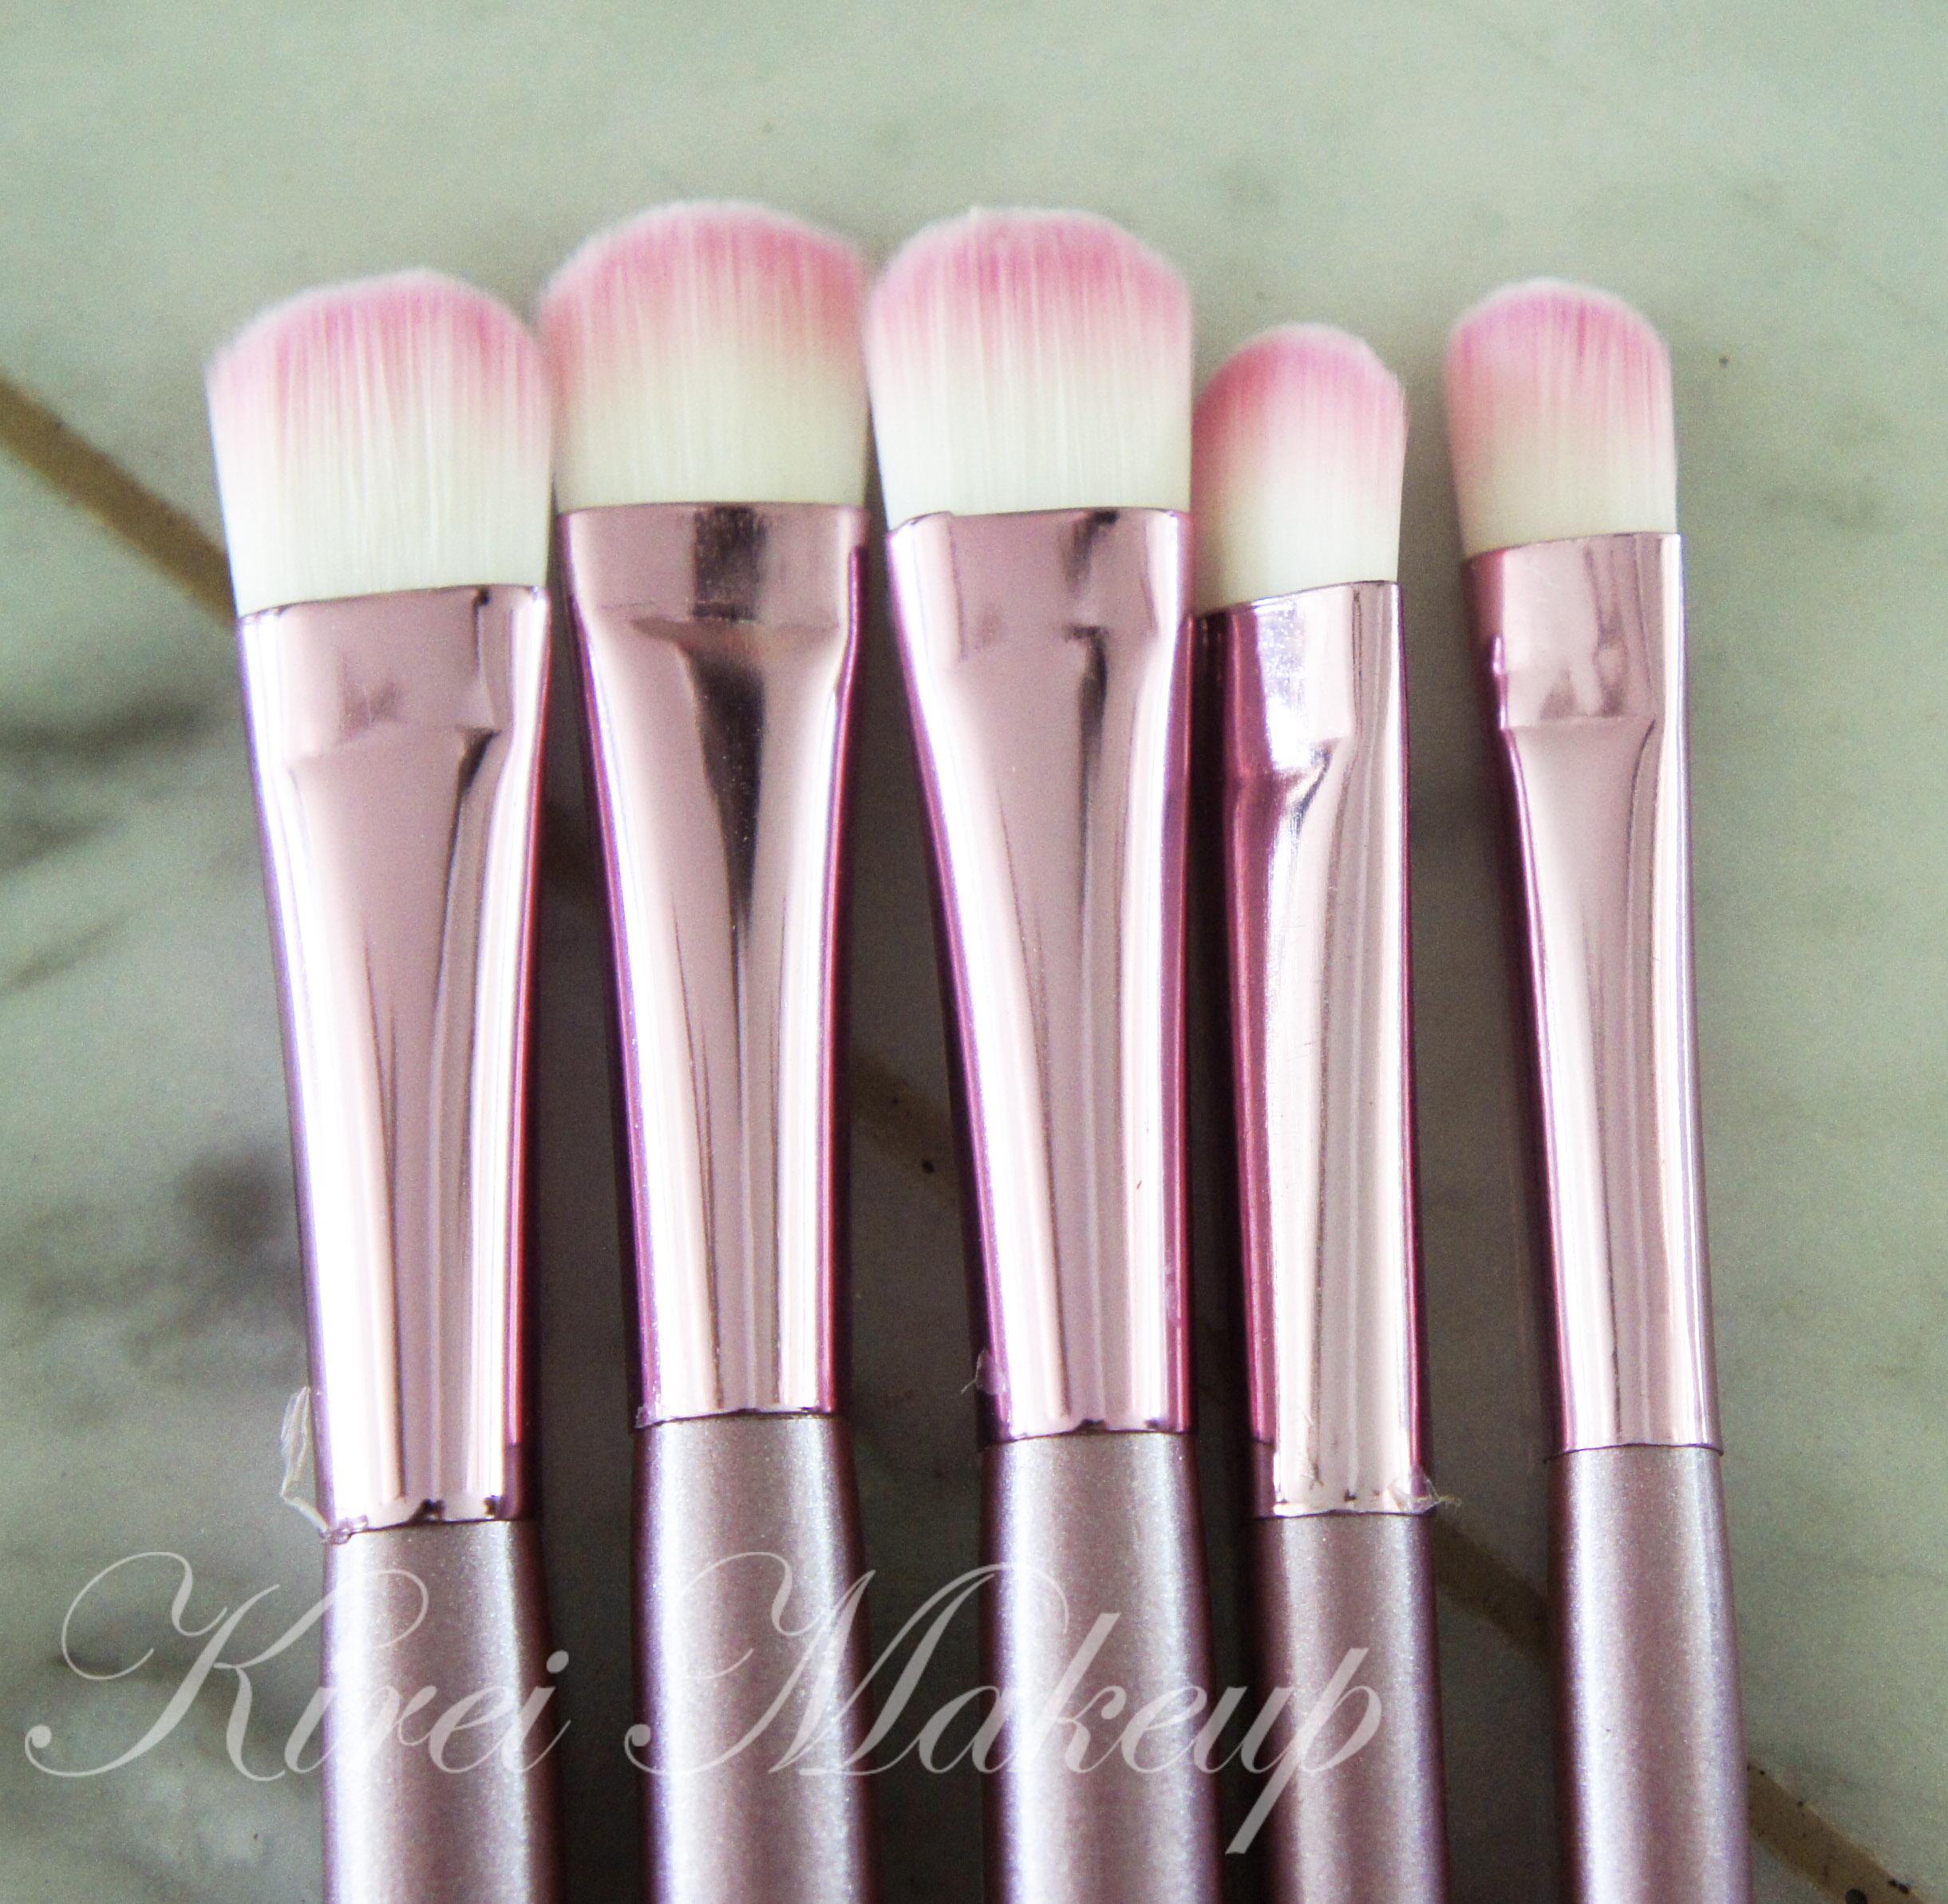 Brush Set Makeup Murah - Mugeek Vidalondon